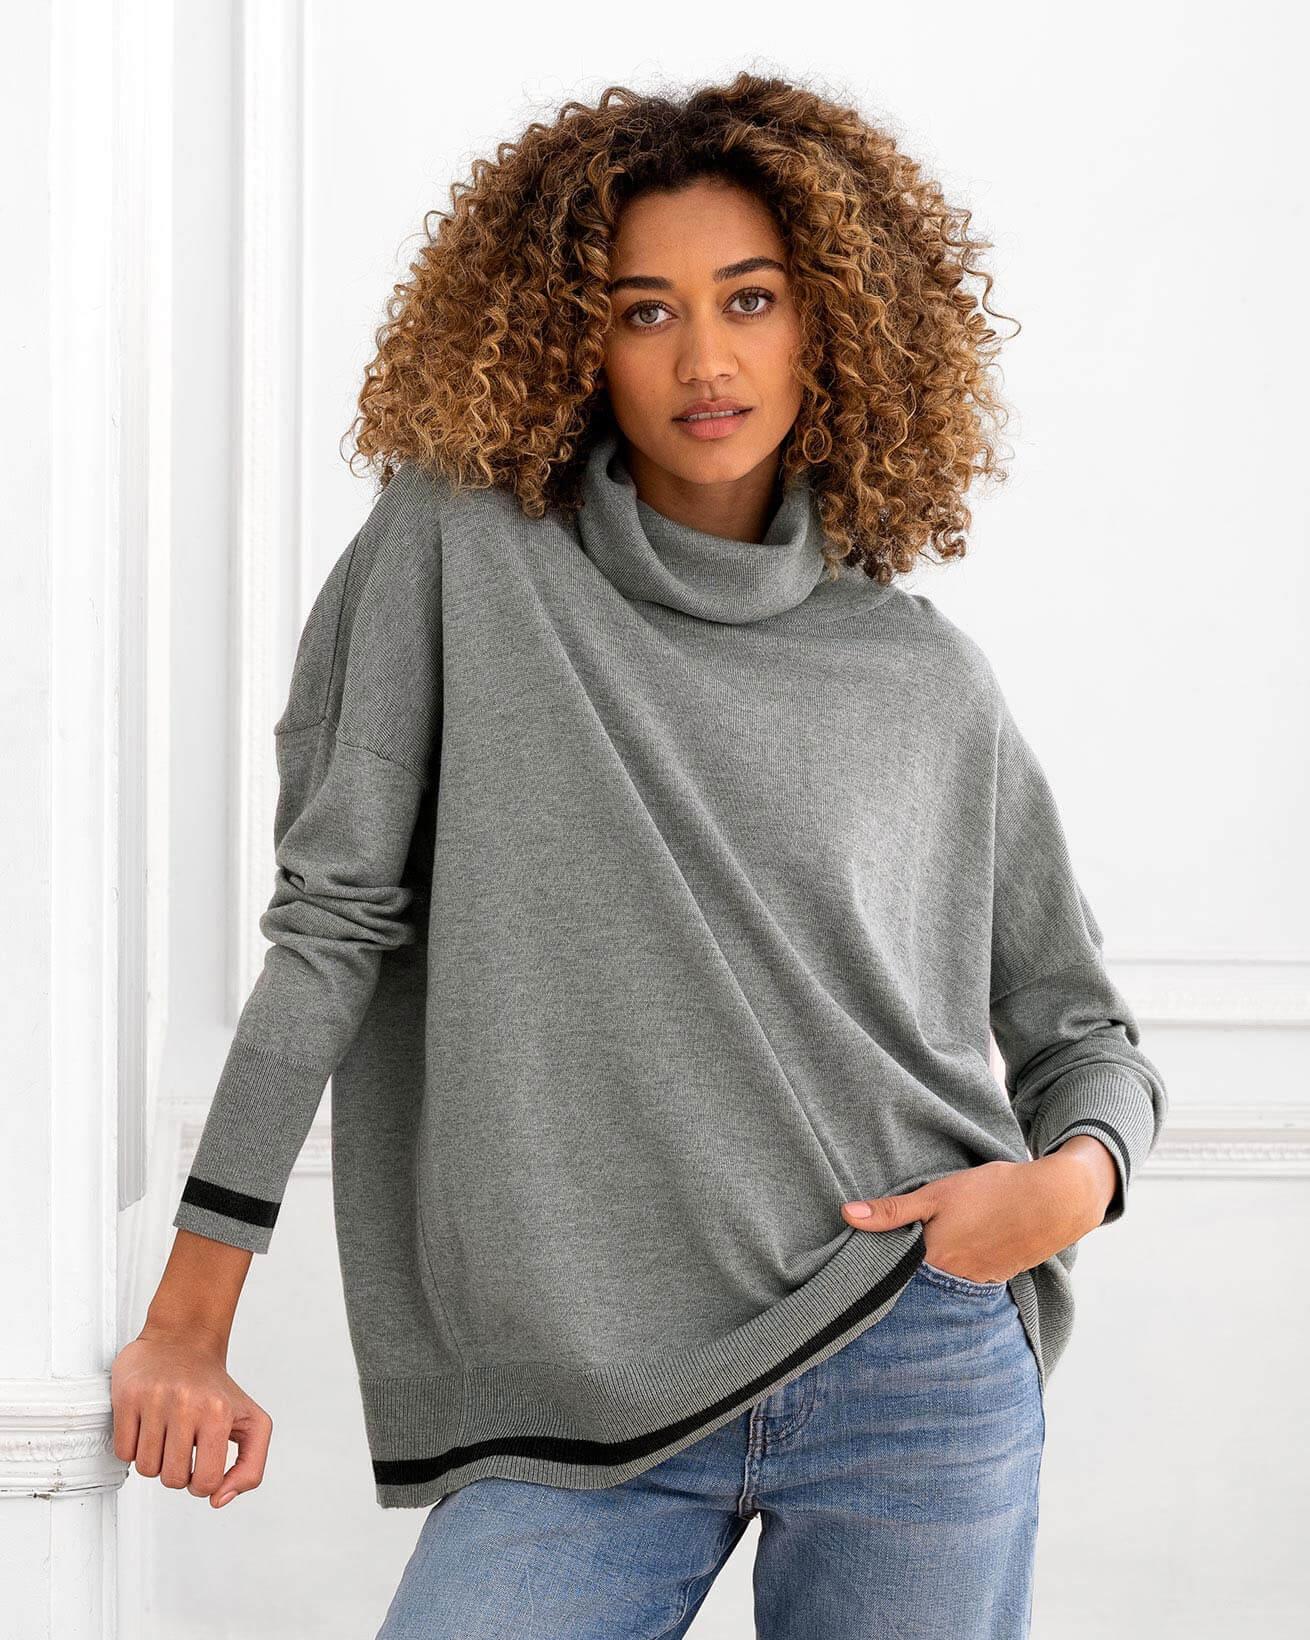 7401-7835_slouchy-fine-knit-roll-neck-jumper_silver-grey-charcoal-savannah-33_lfs.jpg